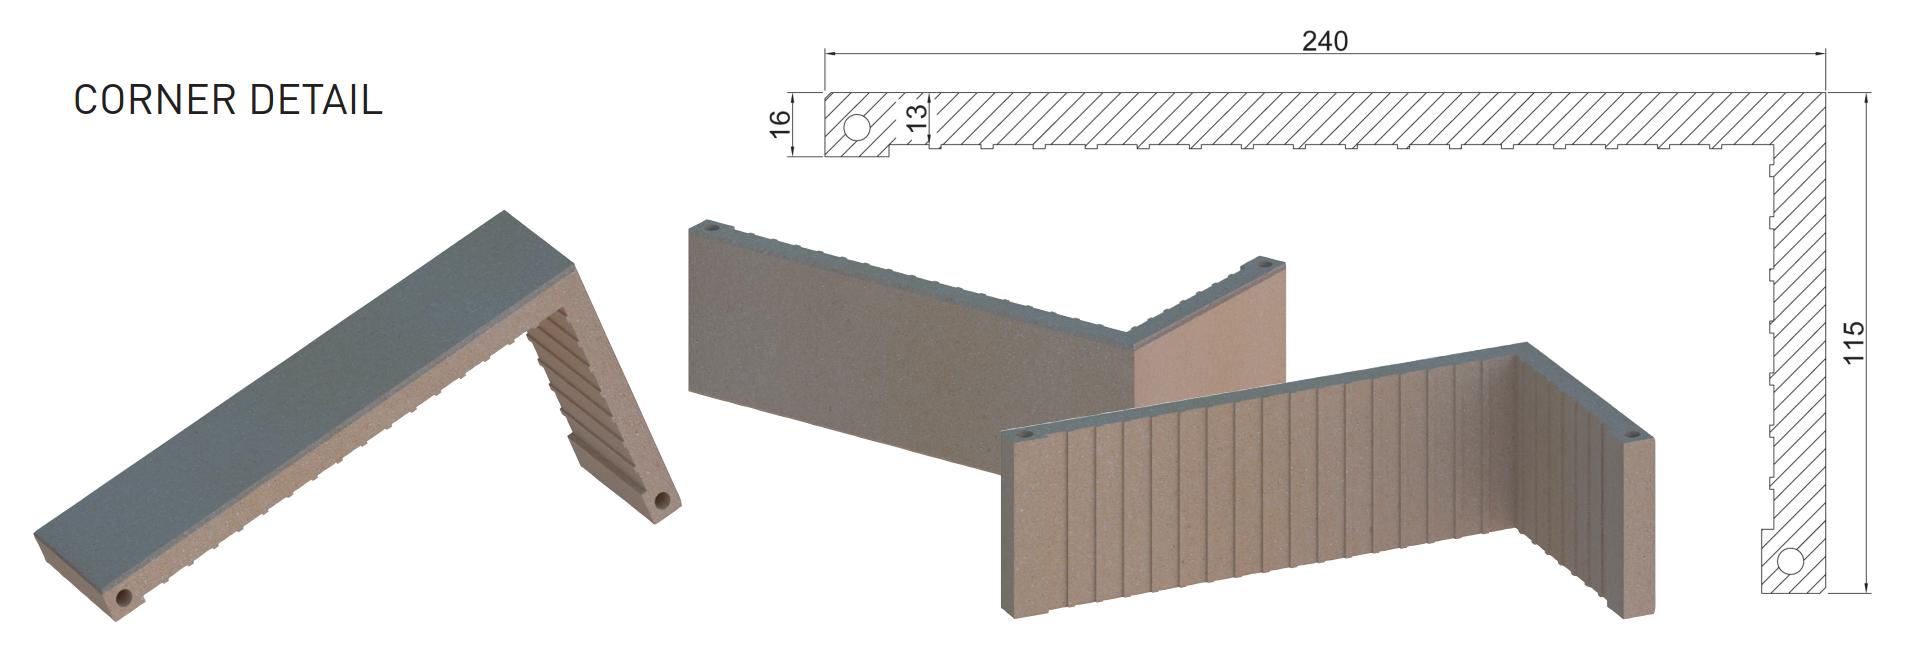 Brick Tile Corner